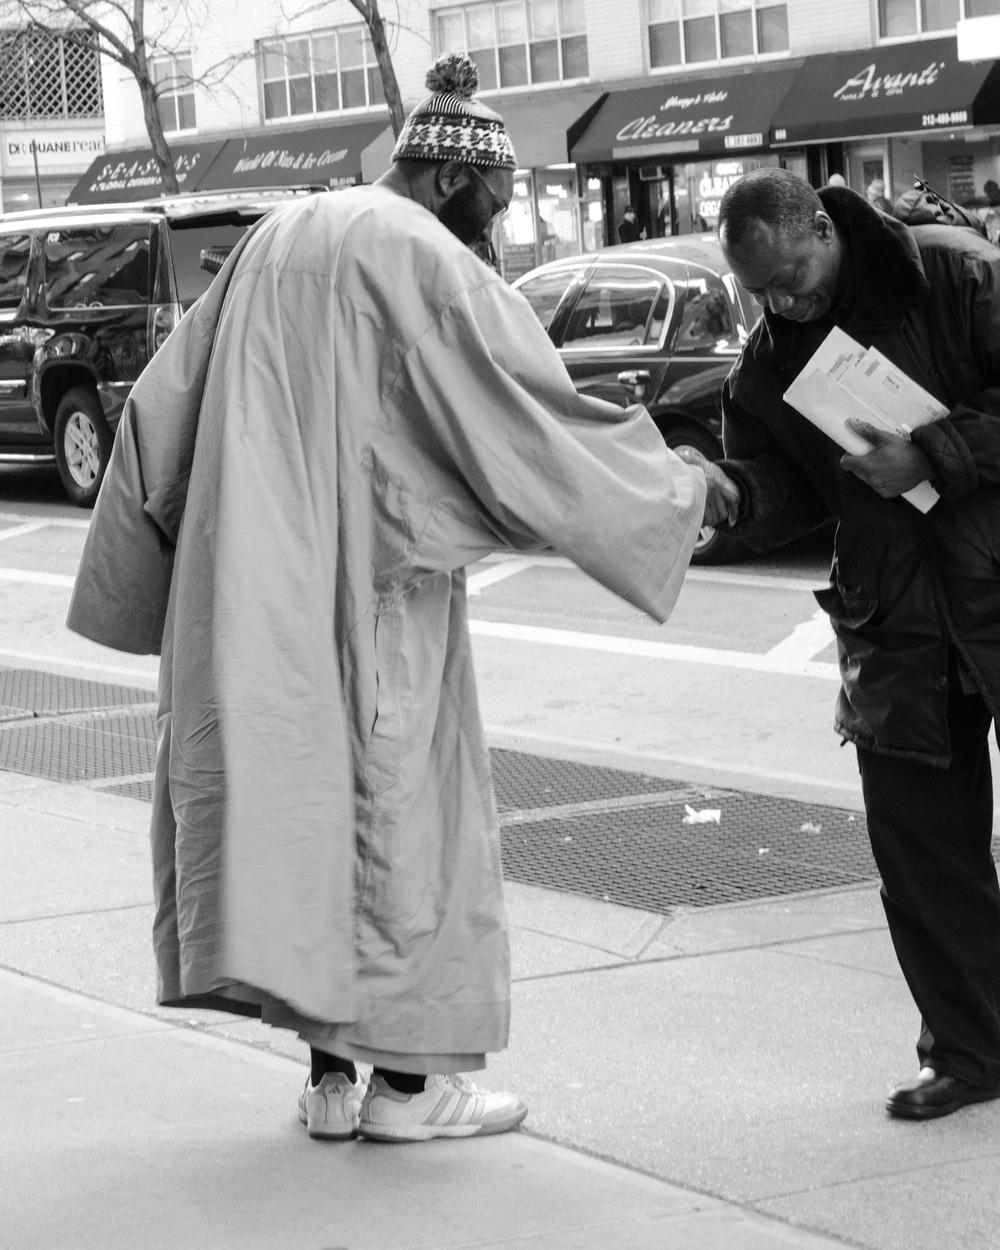 NYC_2013-02-21_-21.jpg